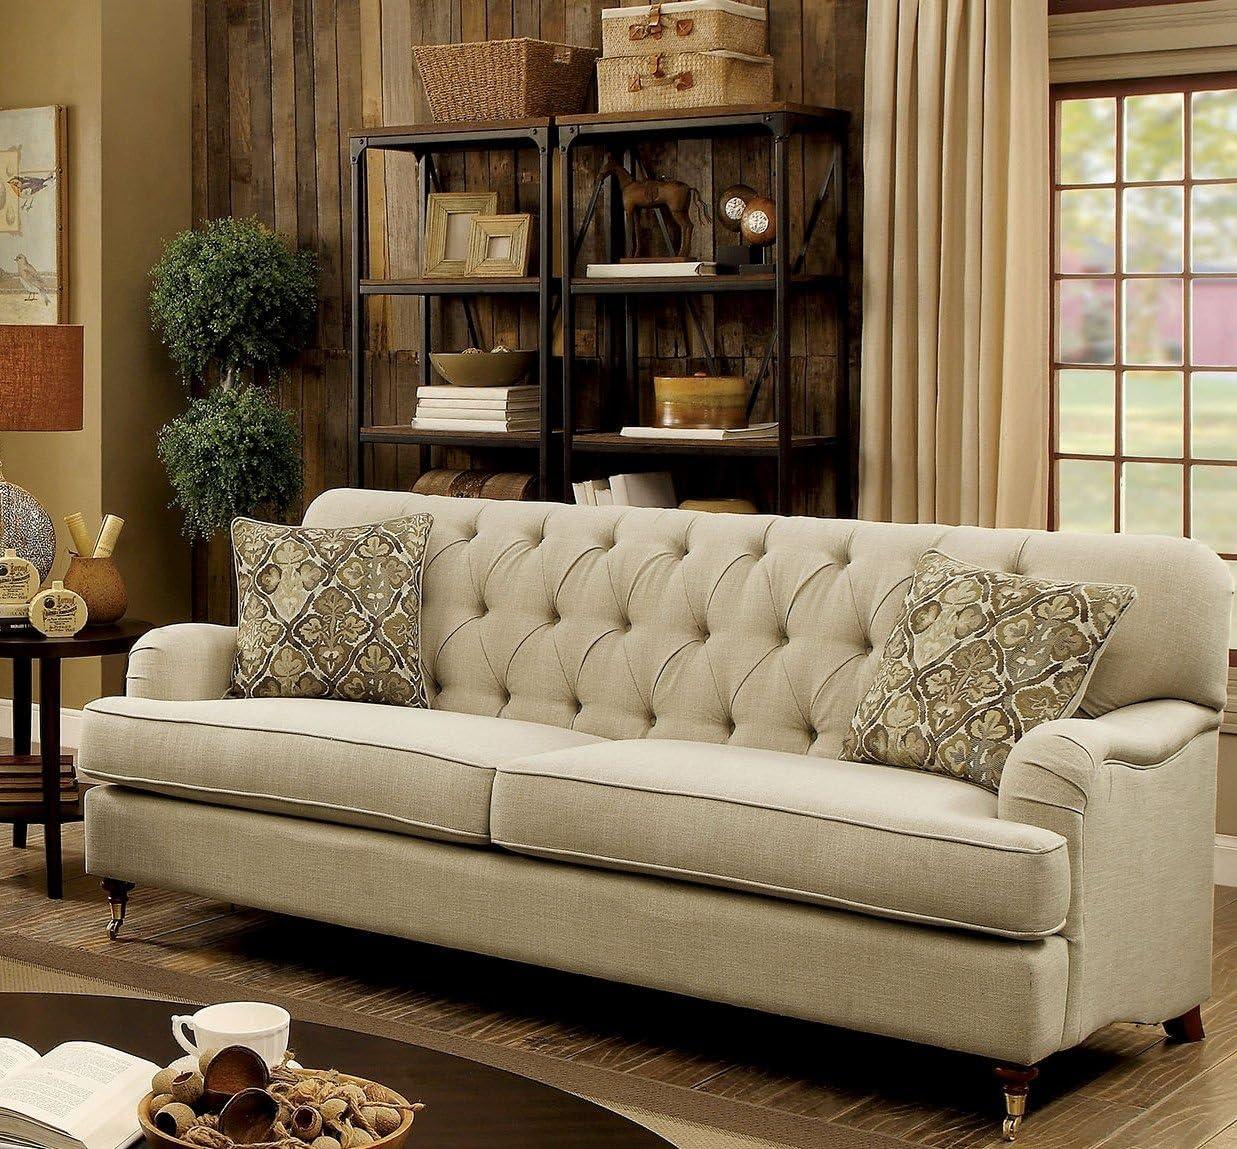 Furniture of America CM6863-SF Laney, Beige